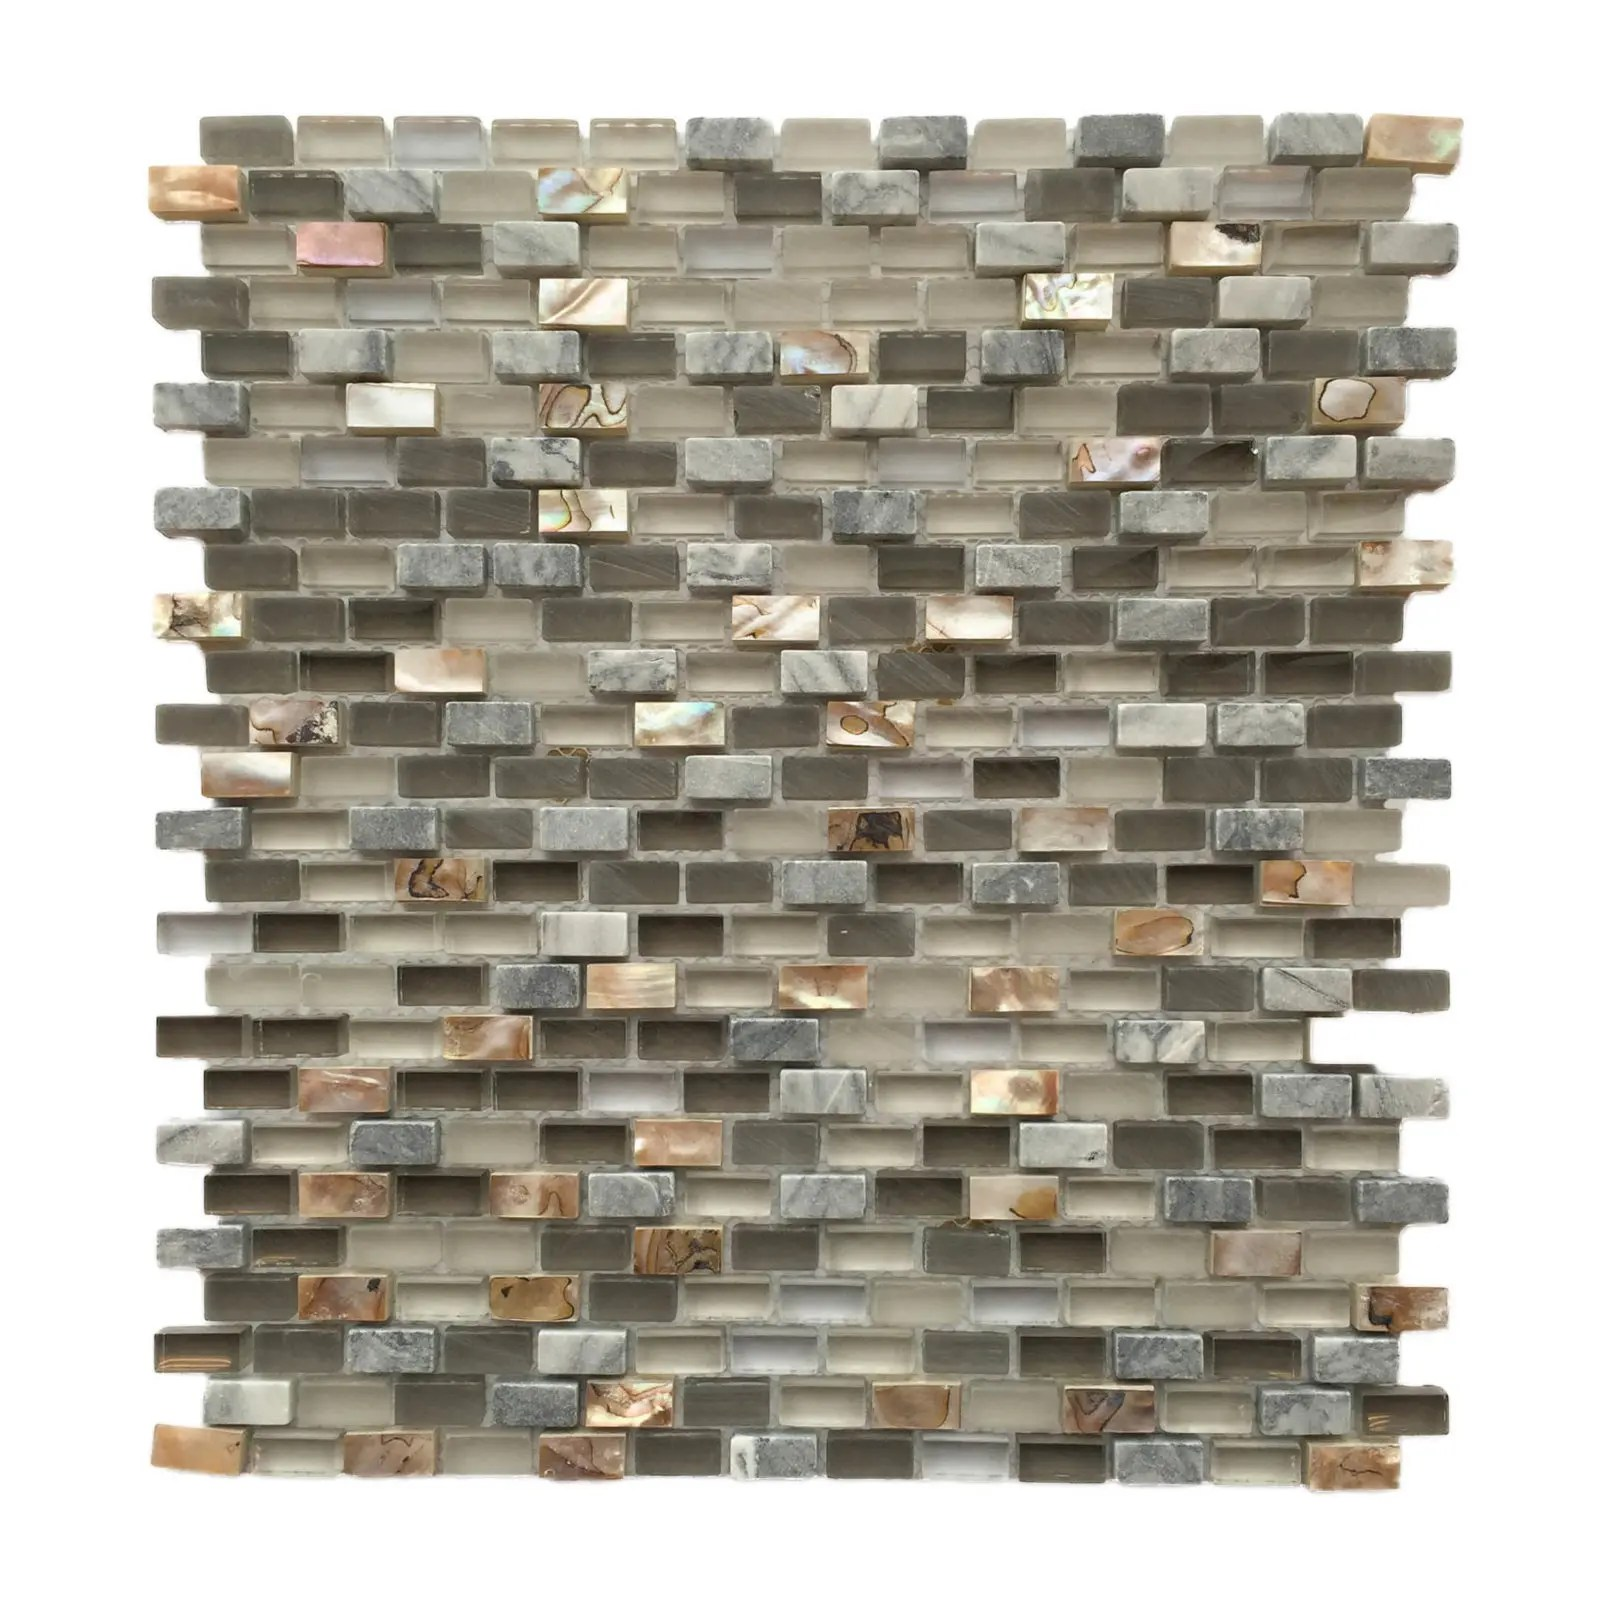 shell grey glass stone shell 3 8 x 3 8 mini brick mosaic backsplash